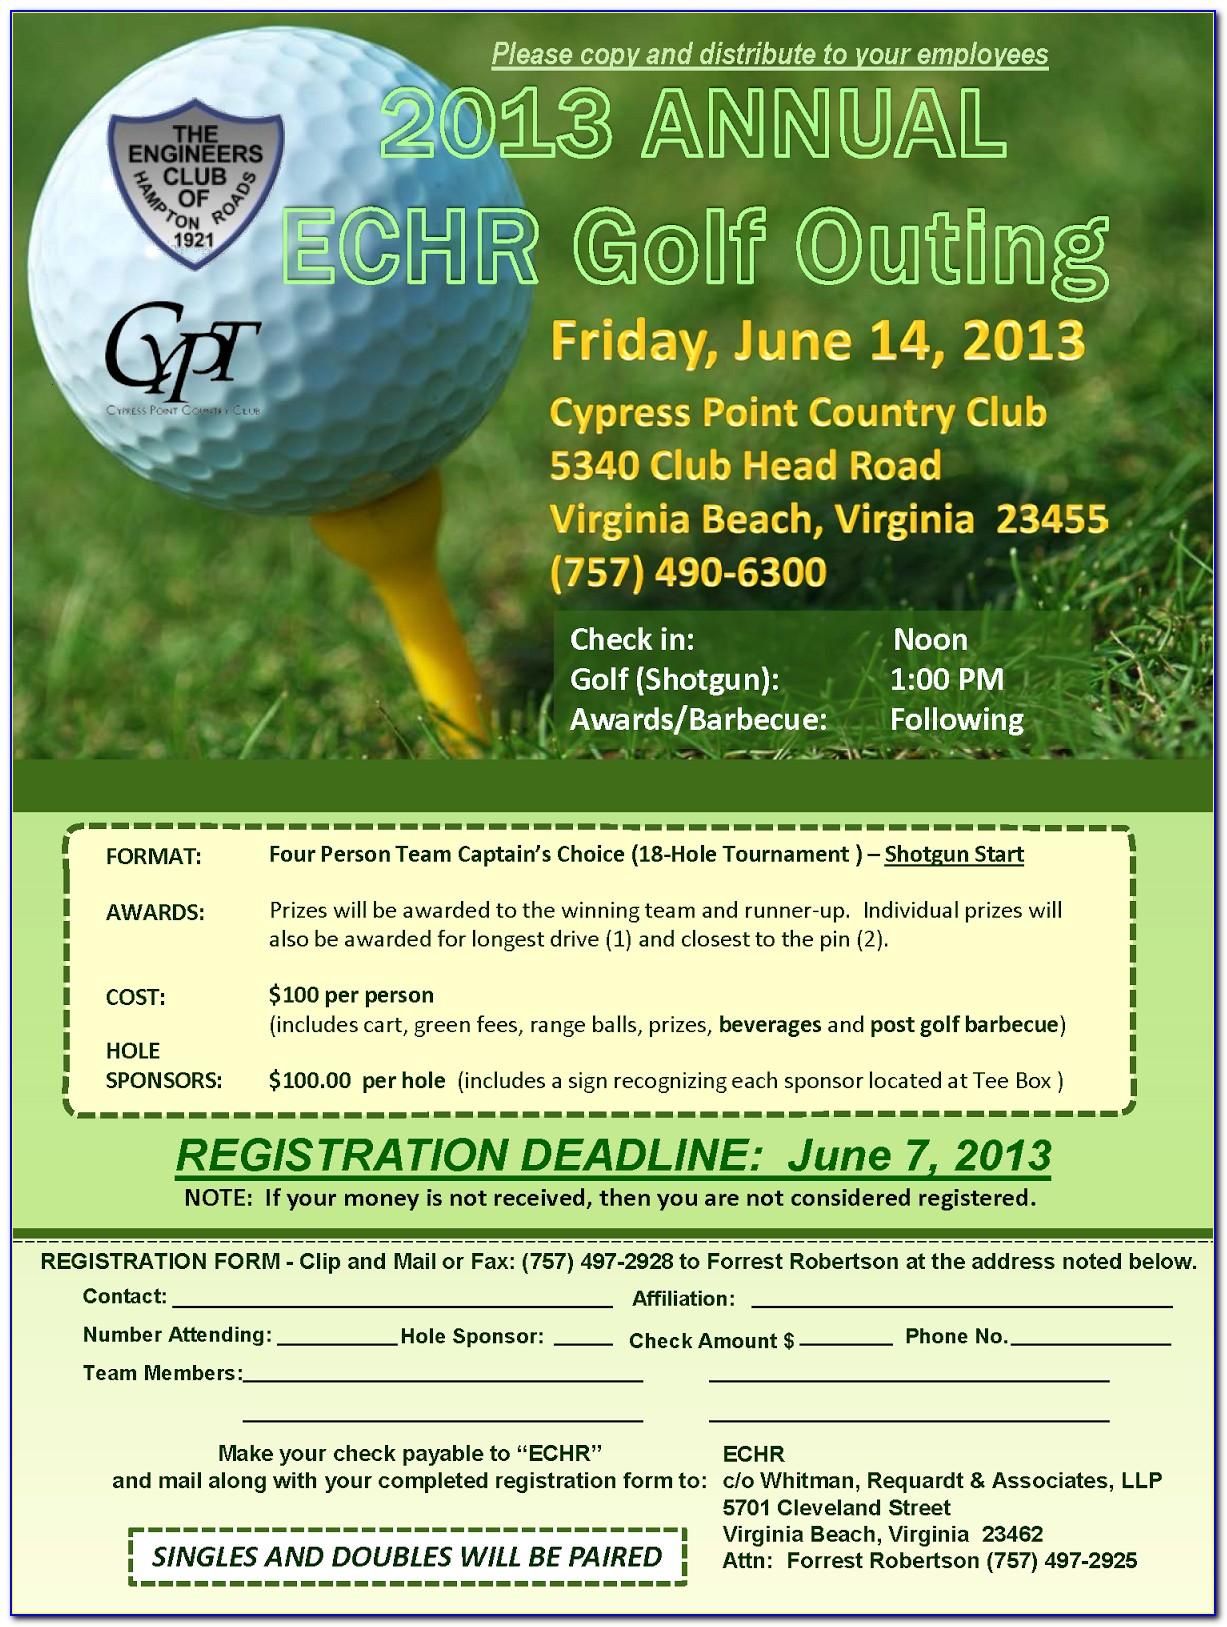 Golf Outing Brochure Ideas